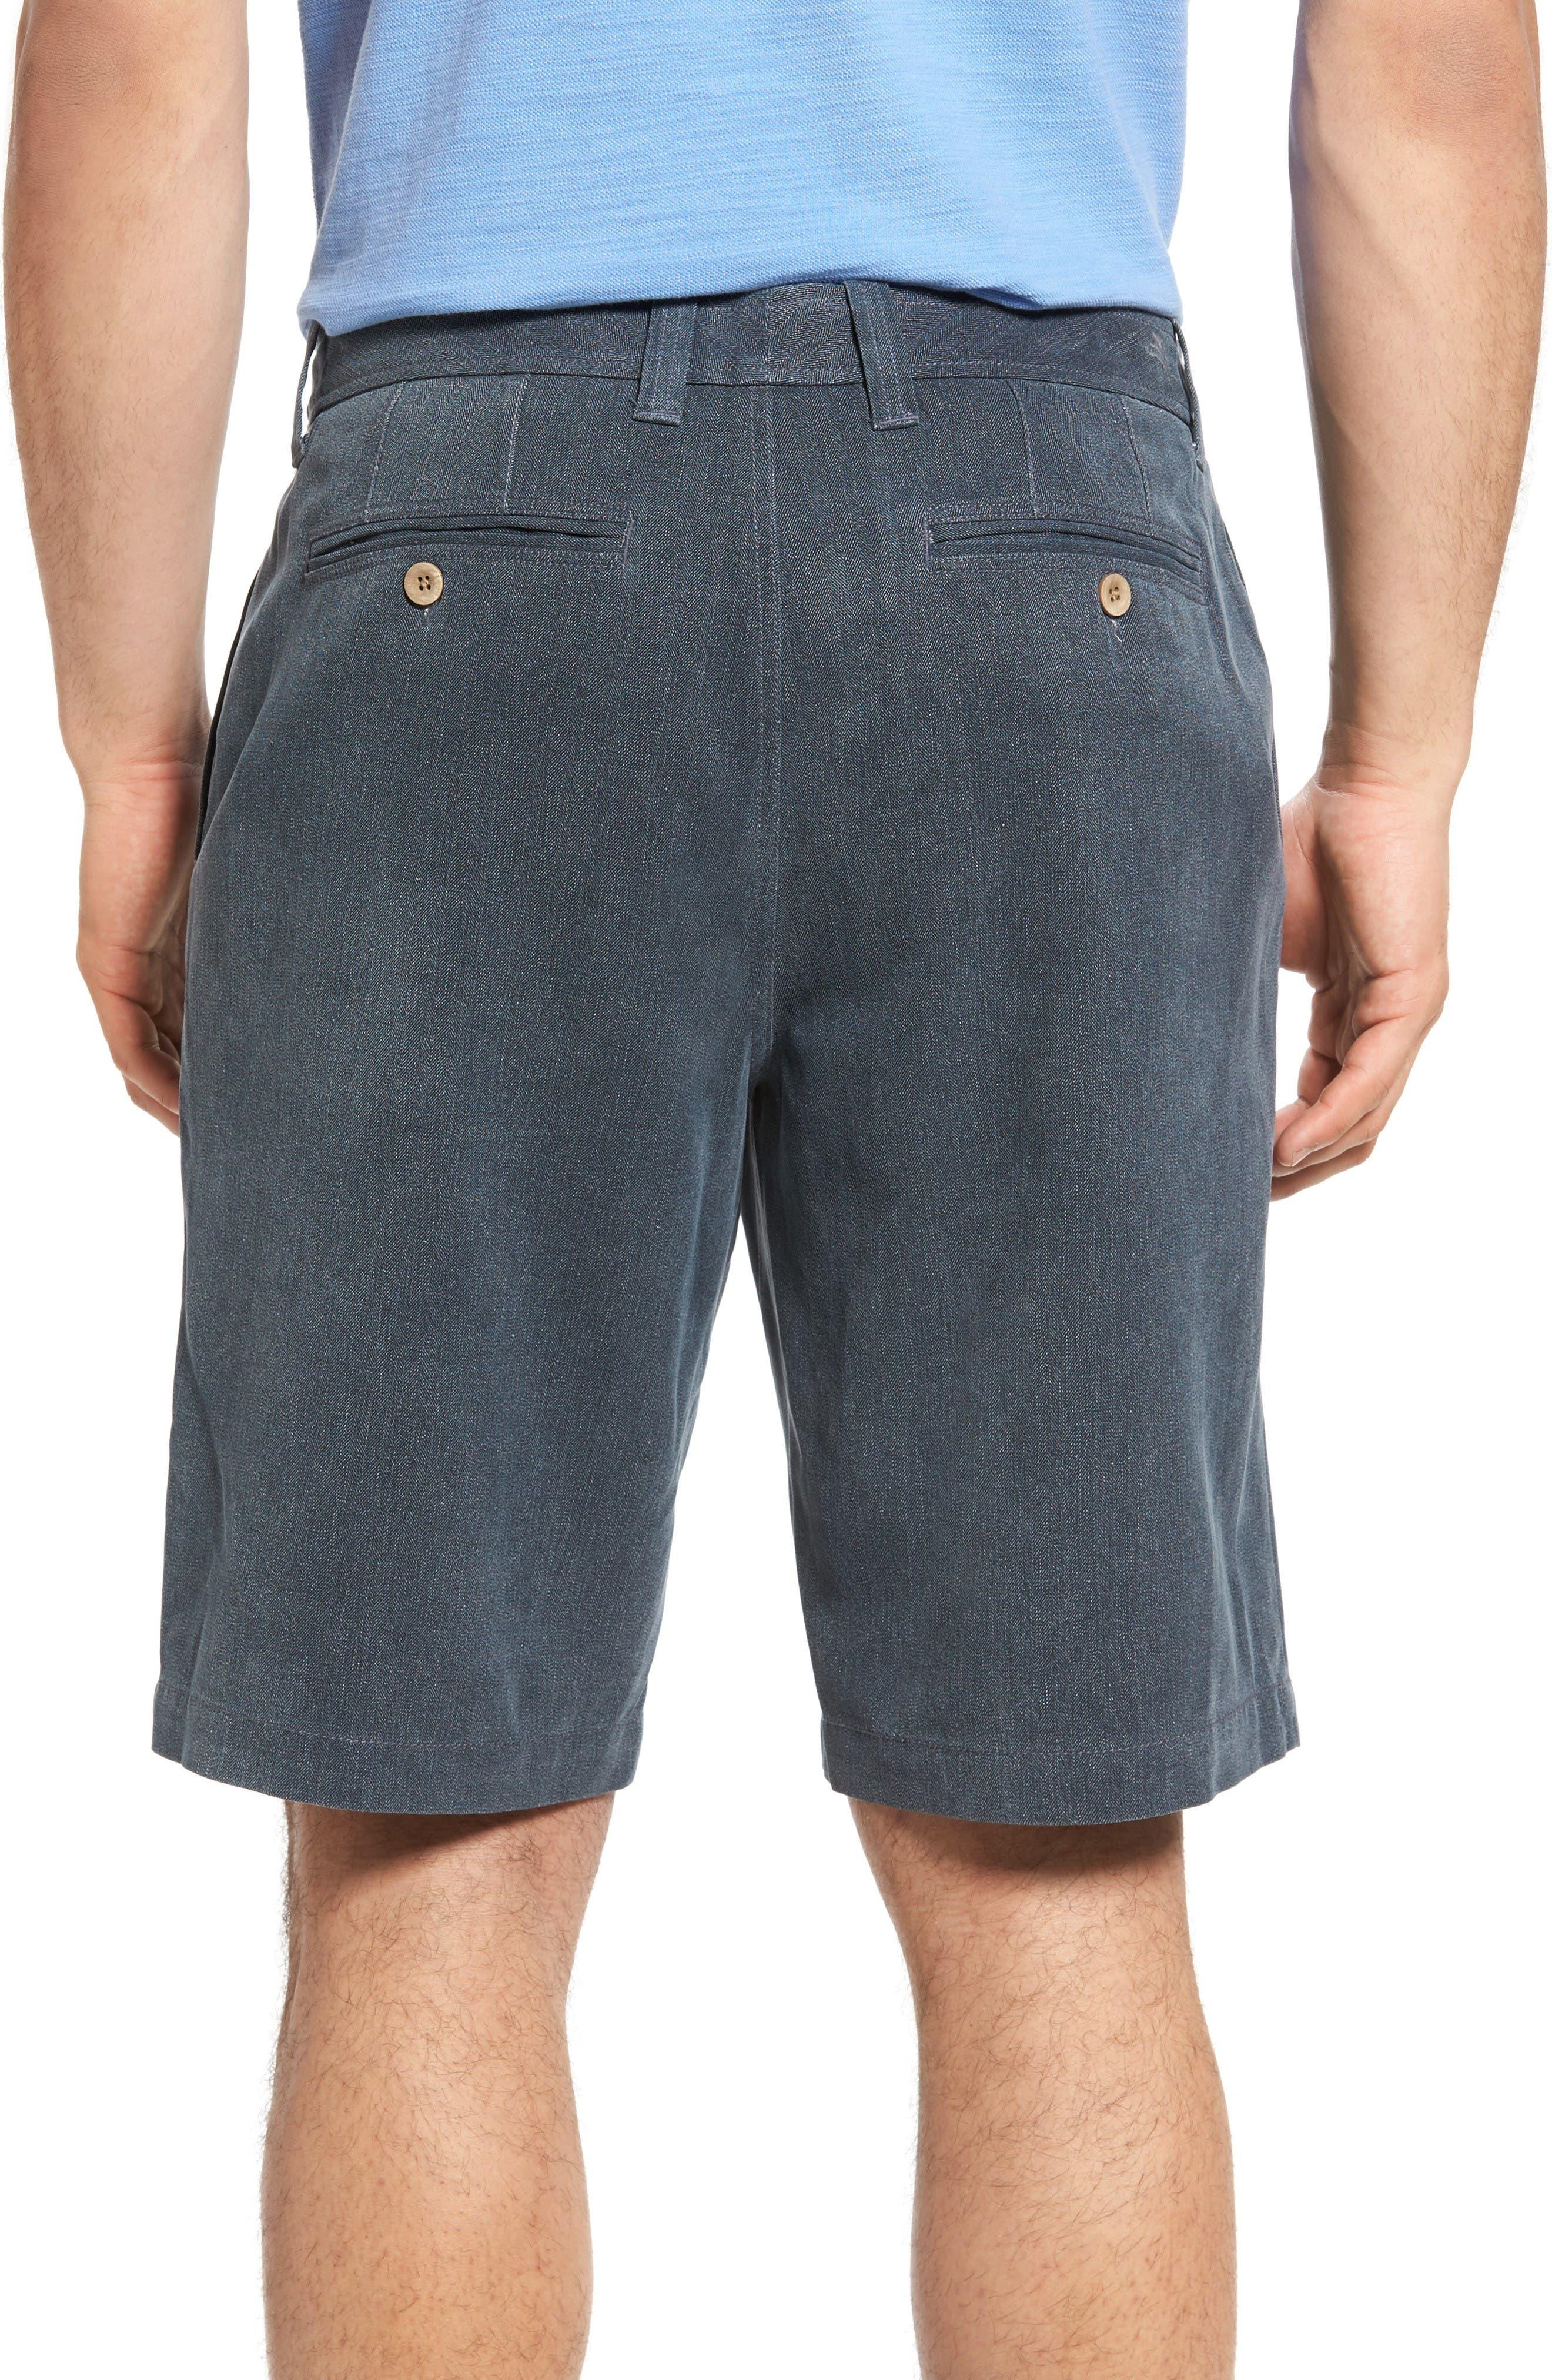 Alternate Image 2  - Tommy Bahama Havana Herringbone Silk Blend Chino Shorts